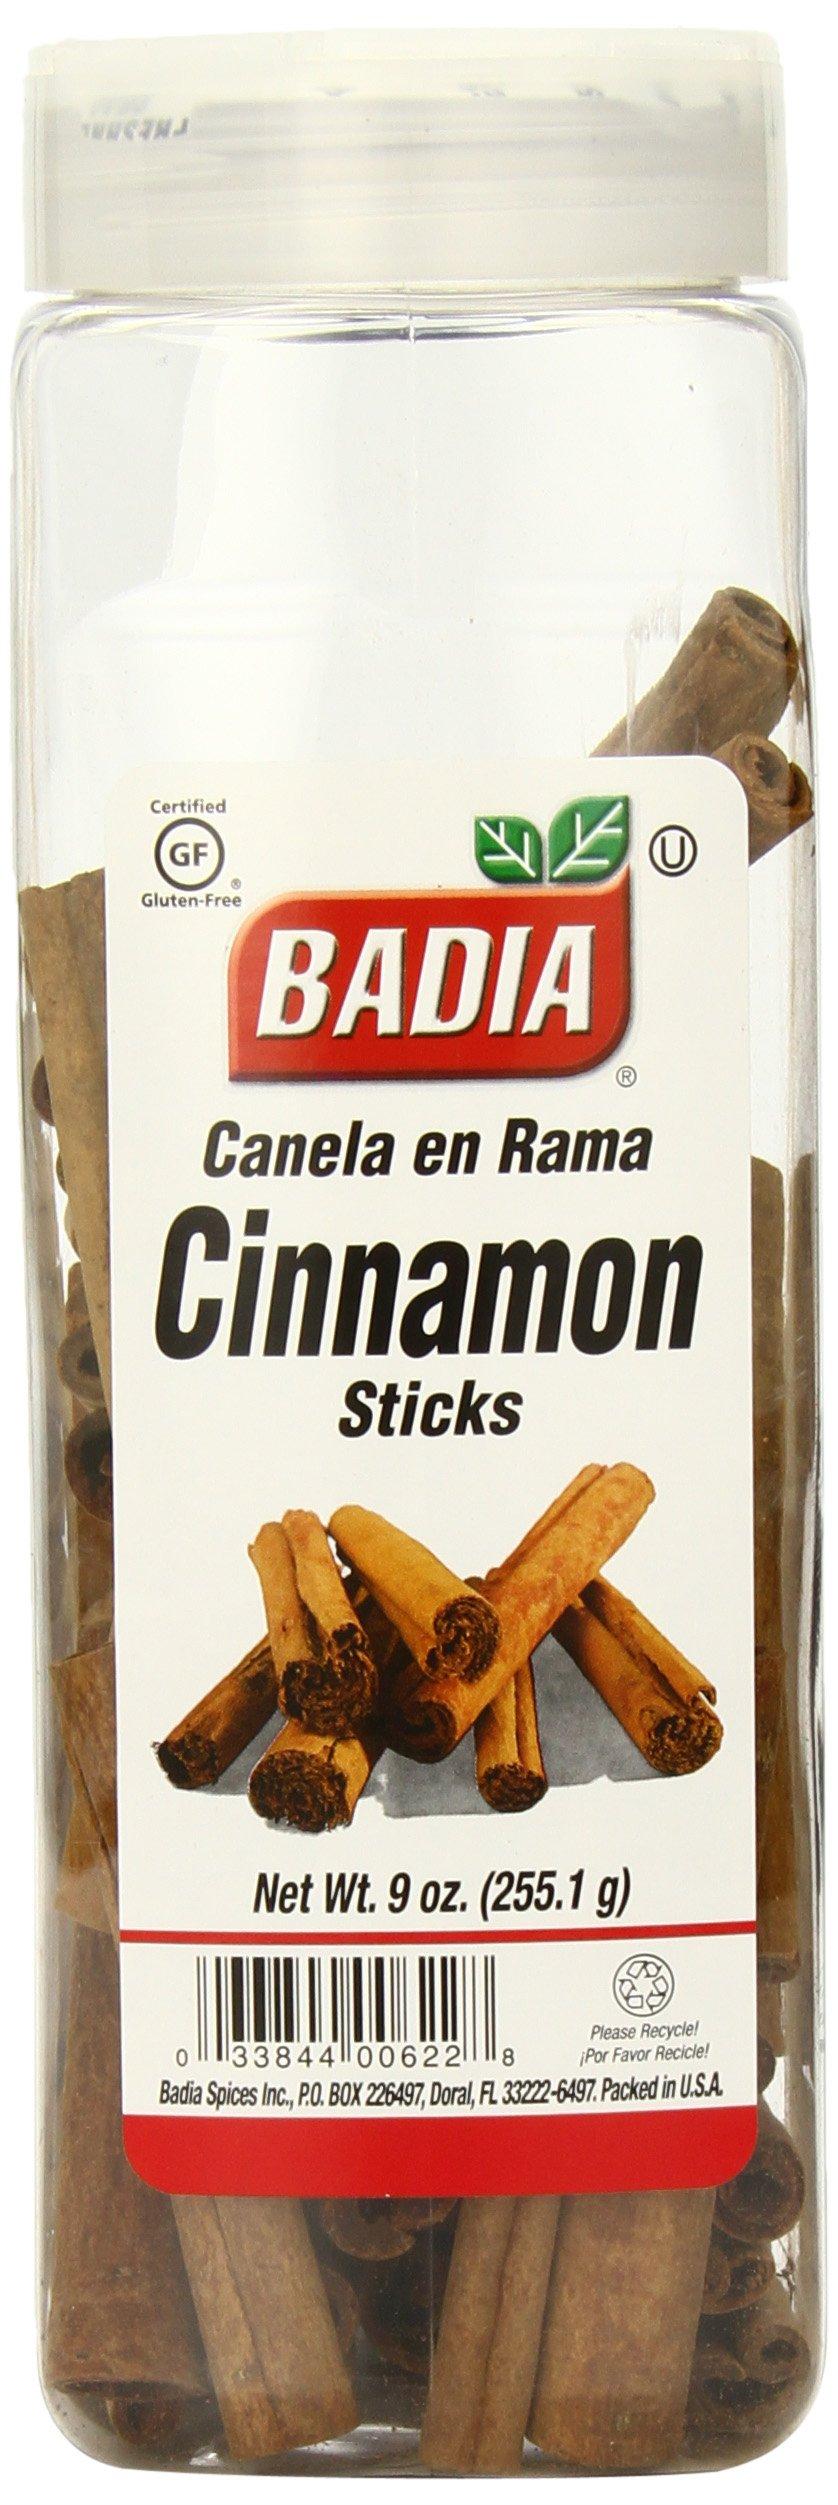 Badia Cinnamon Sticks, 9 Ounce (Pack of 6)